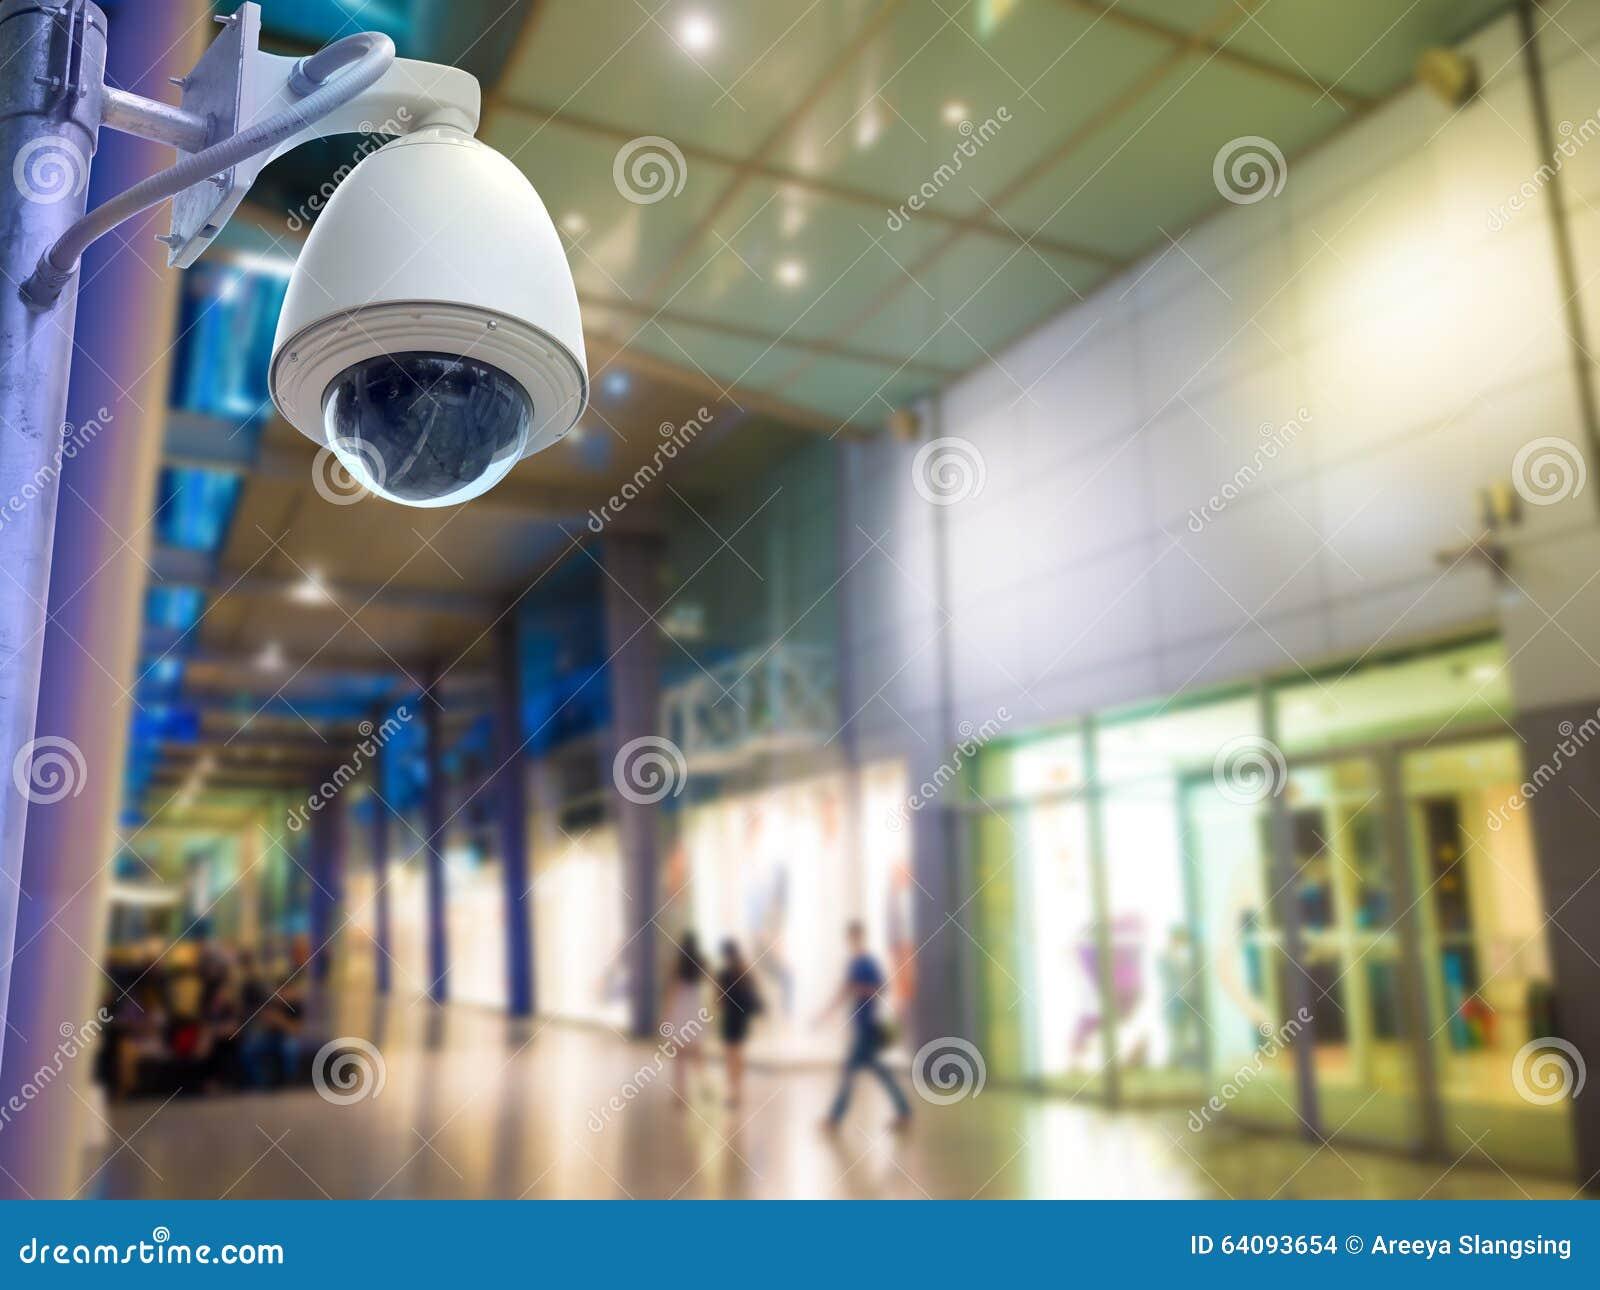 Videocamera di sicurezza di sorveglianza o cctv nel centro - Videocamera di sicurezza ...